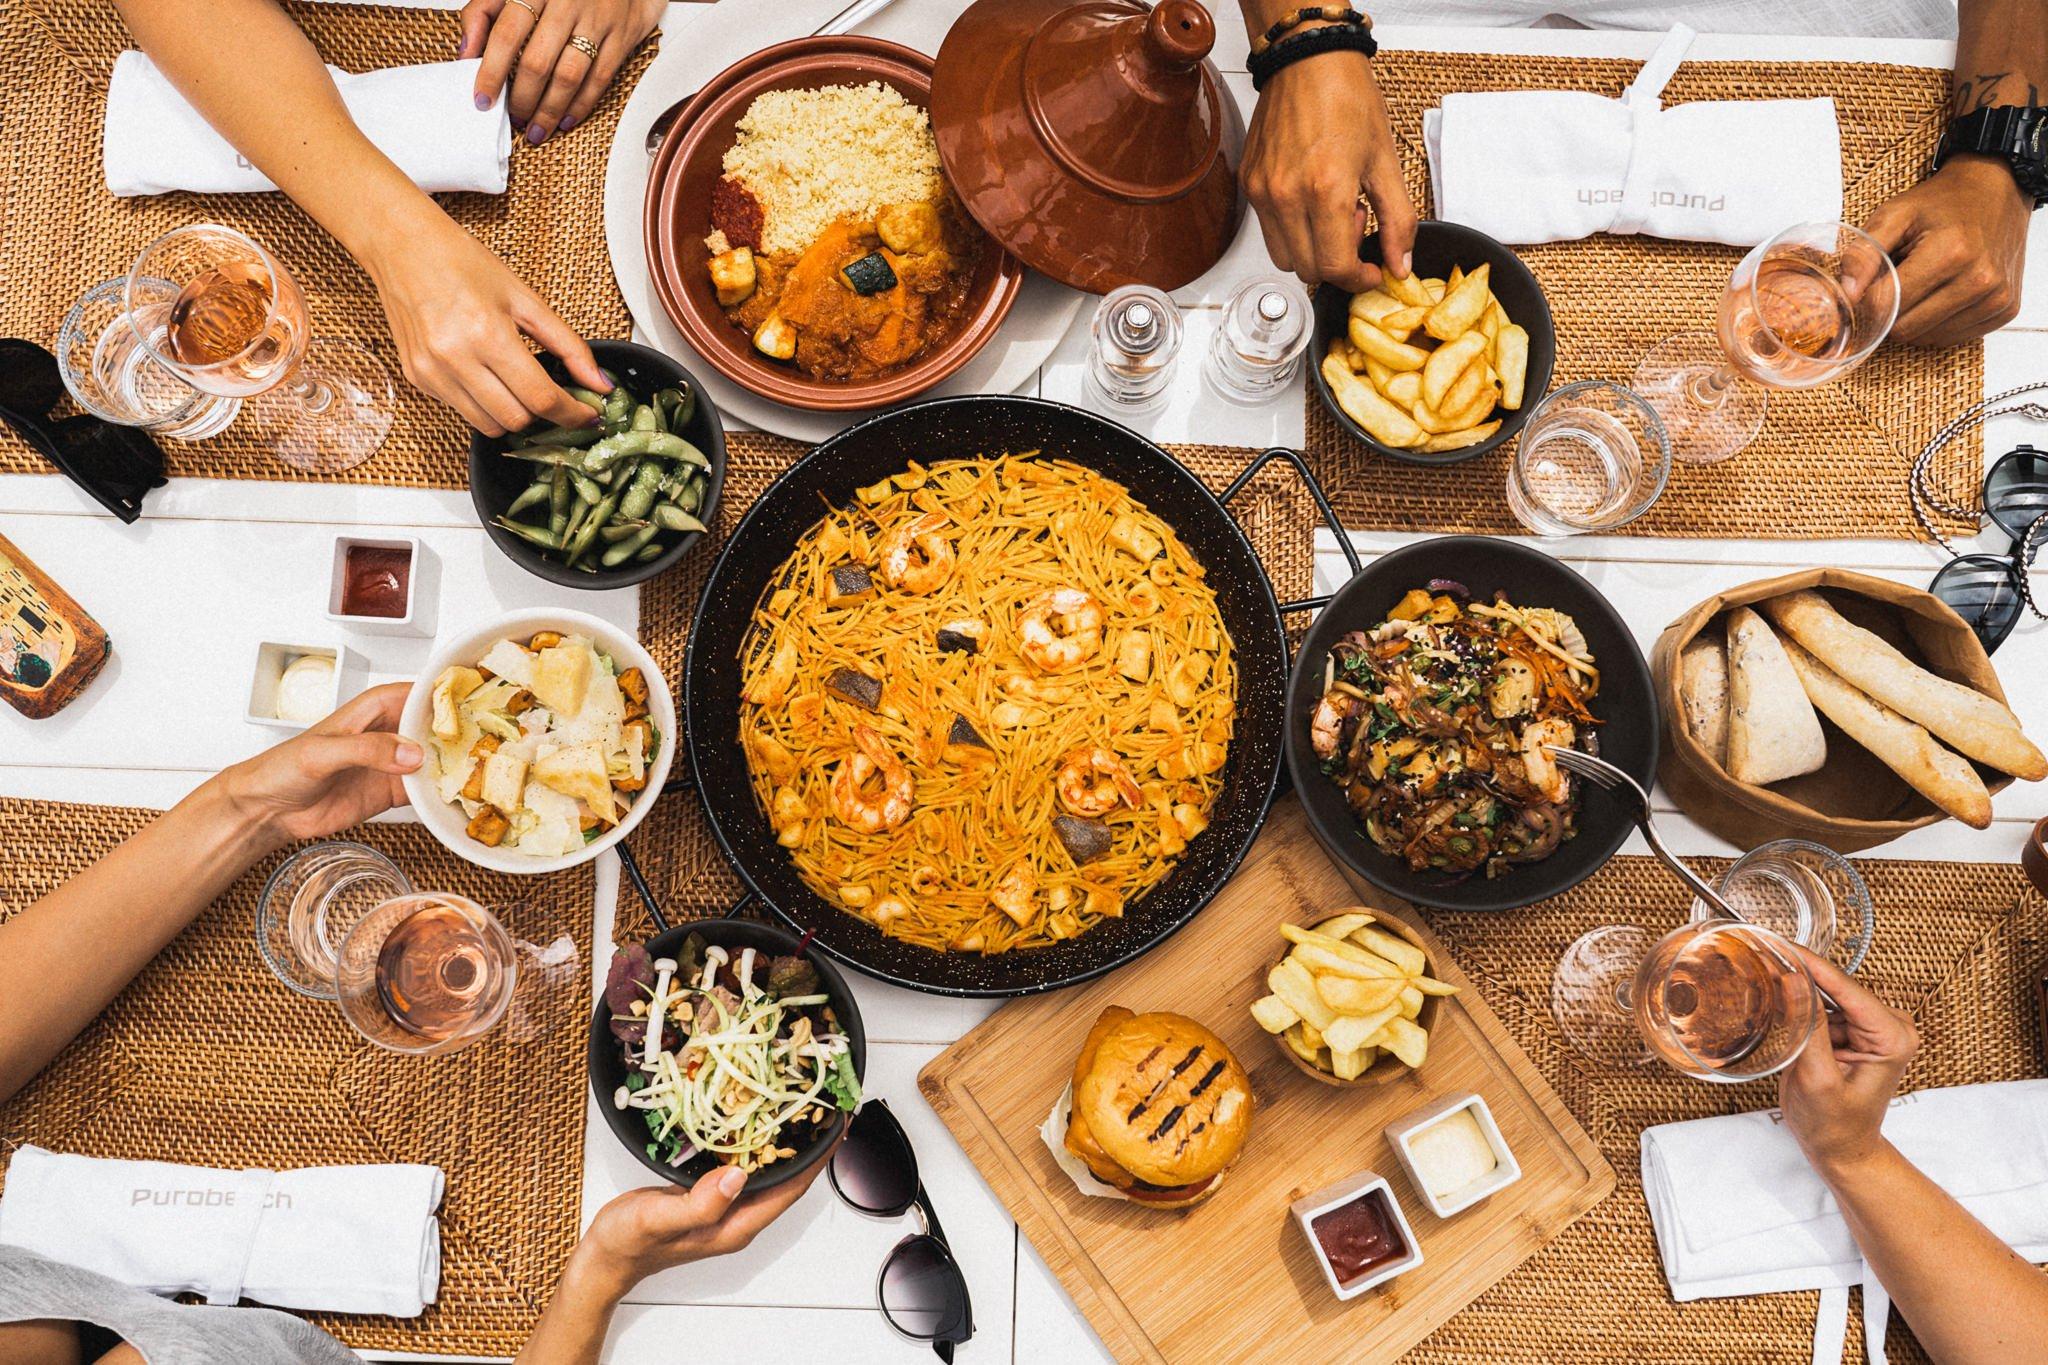 Gastronomic experience - Purobeach Dénia